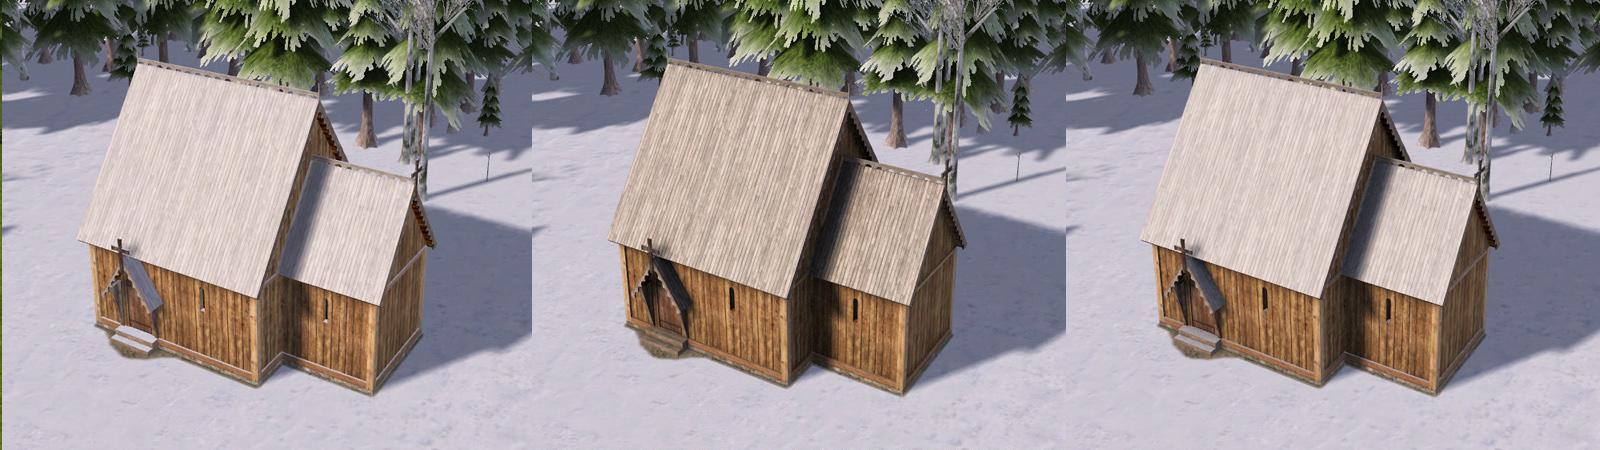 http://www.banishedventures.com/images/ao-snow.jpg